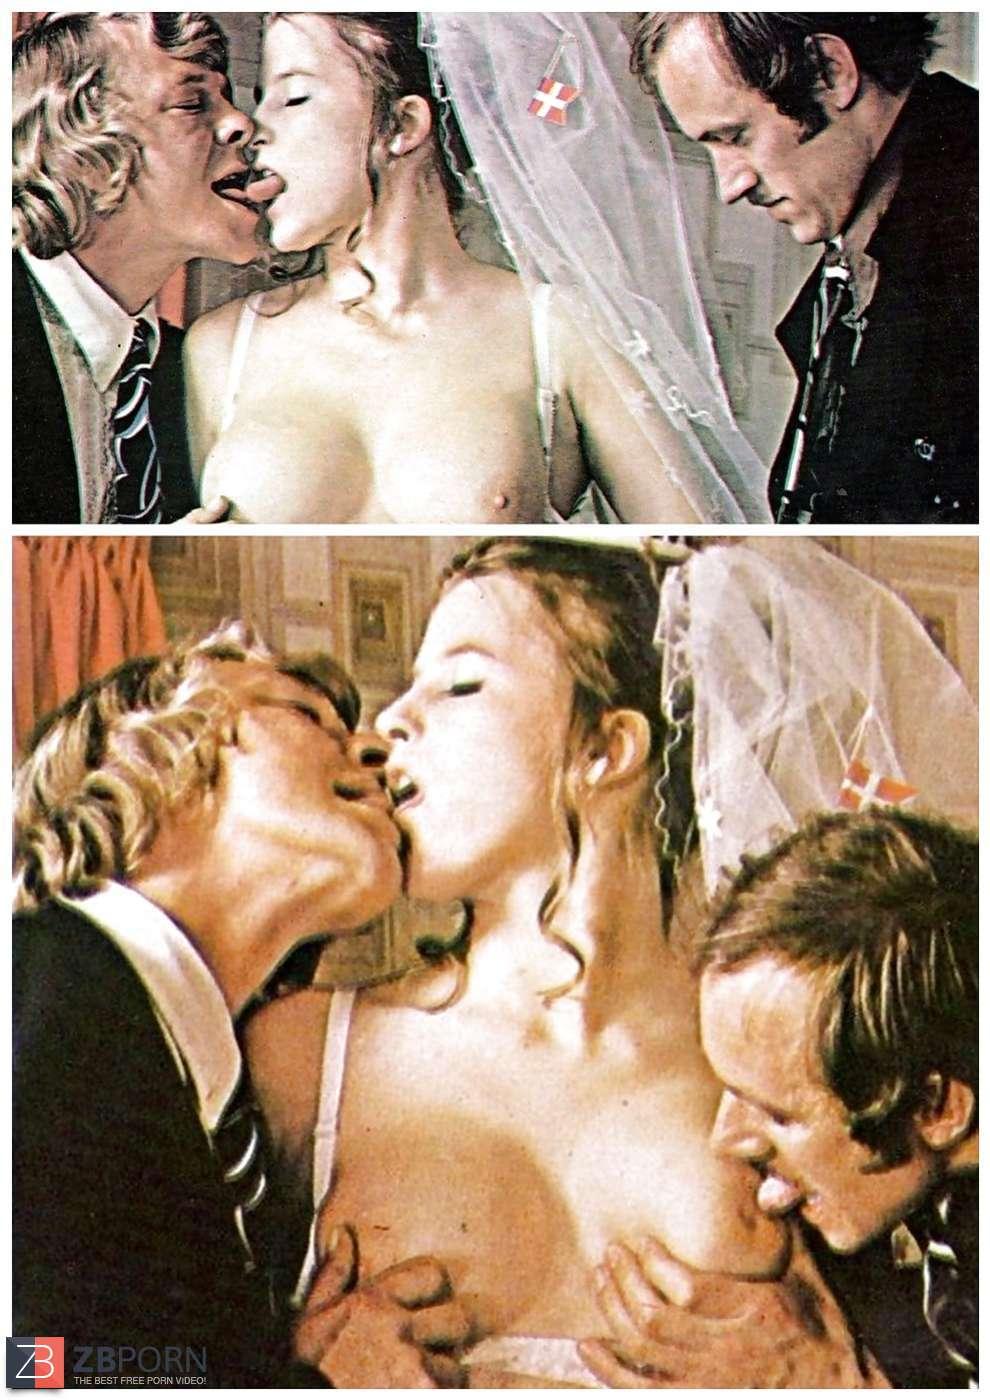 Vintage Set - Wedding Night Cheating Bride  Zb Porn-5096